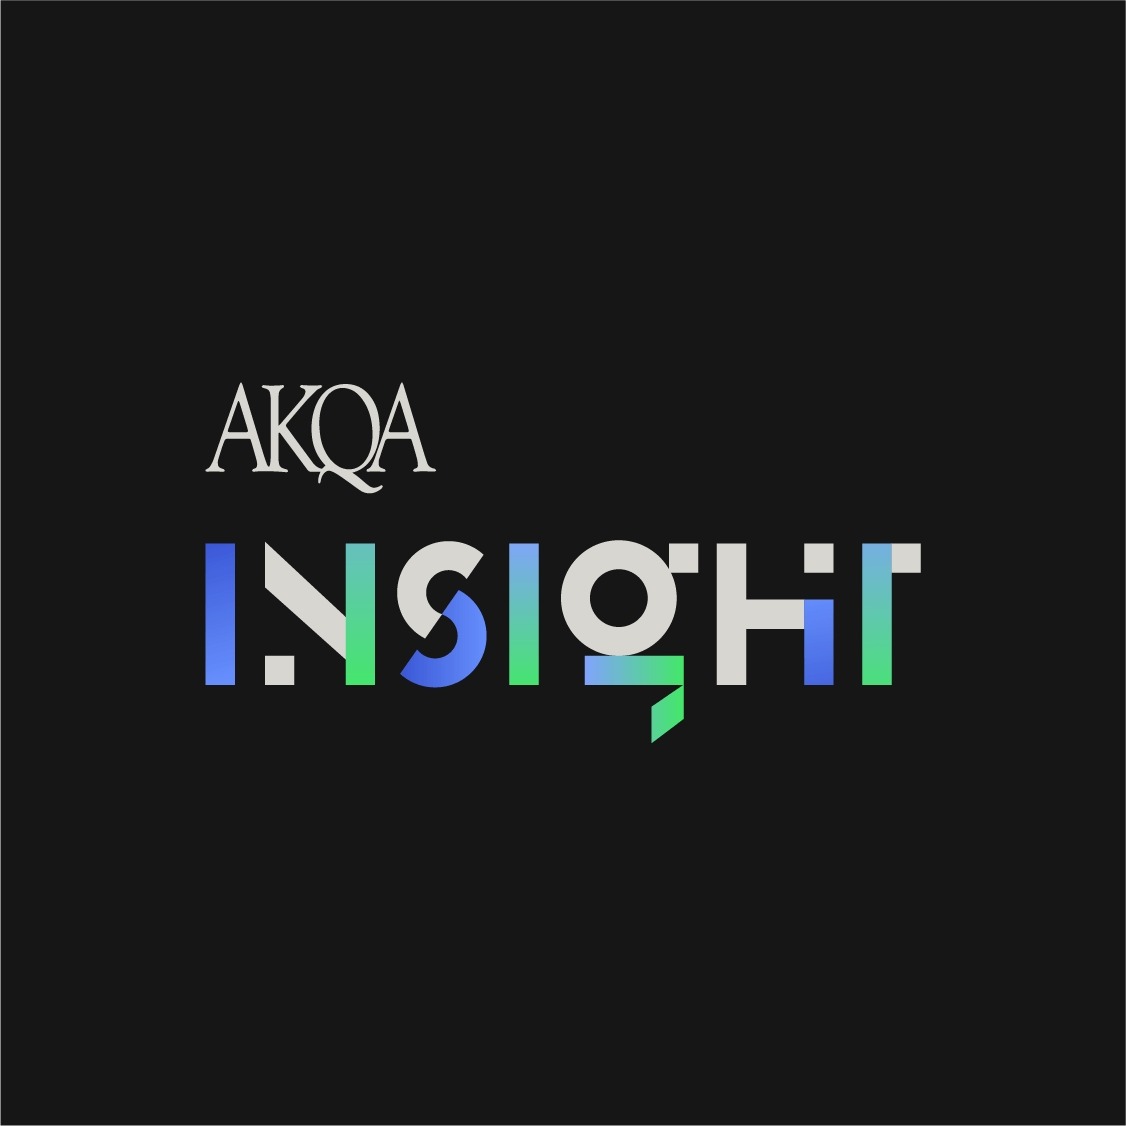 all-logos-2020-23